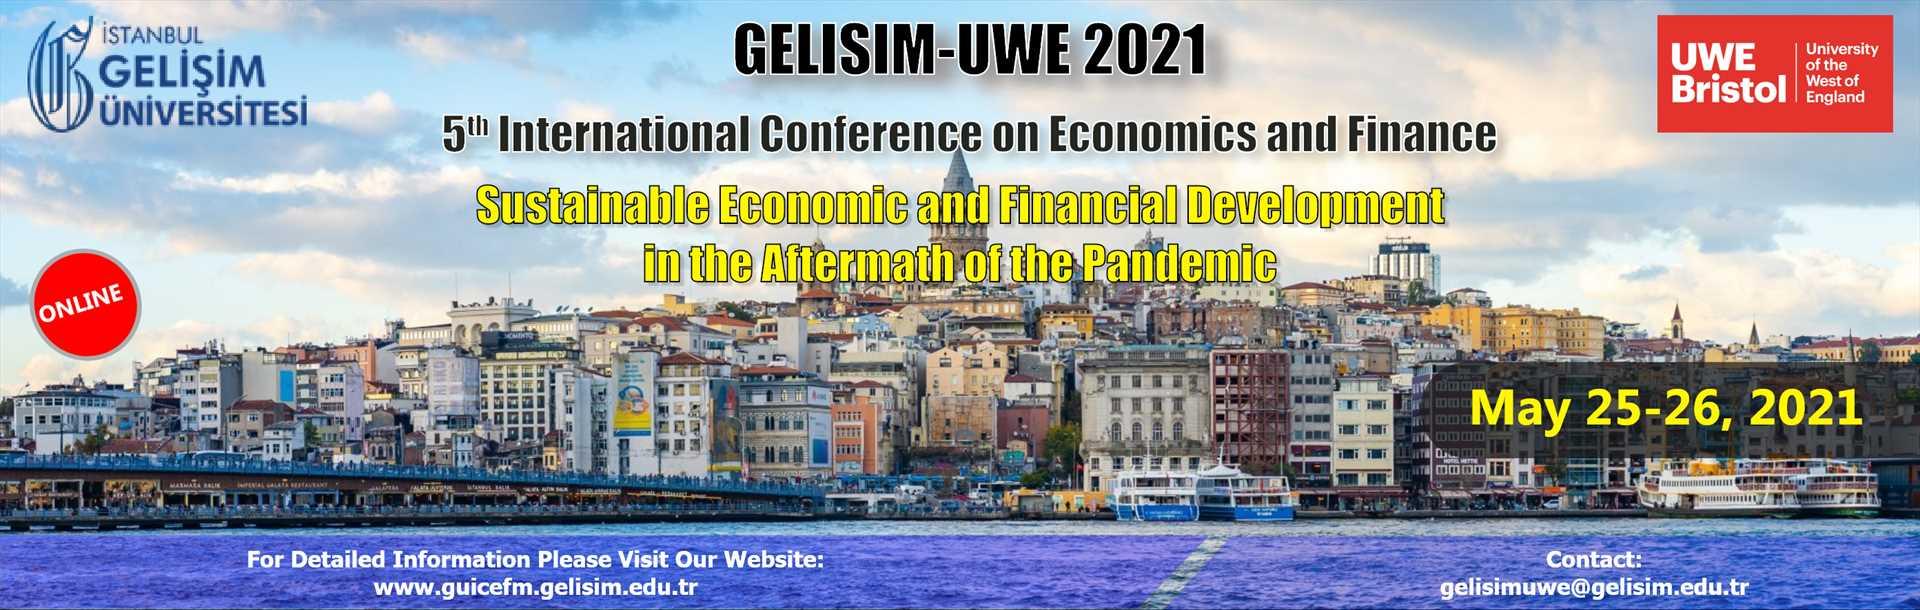 GELISIM-UWE 2021